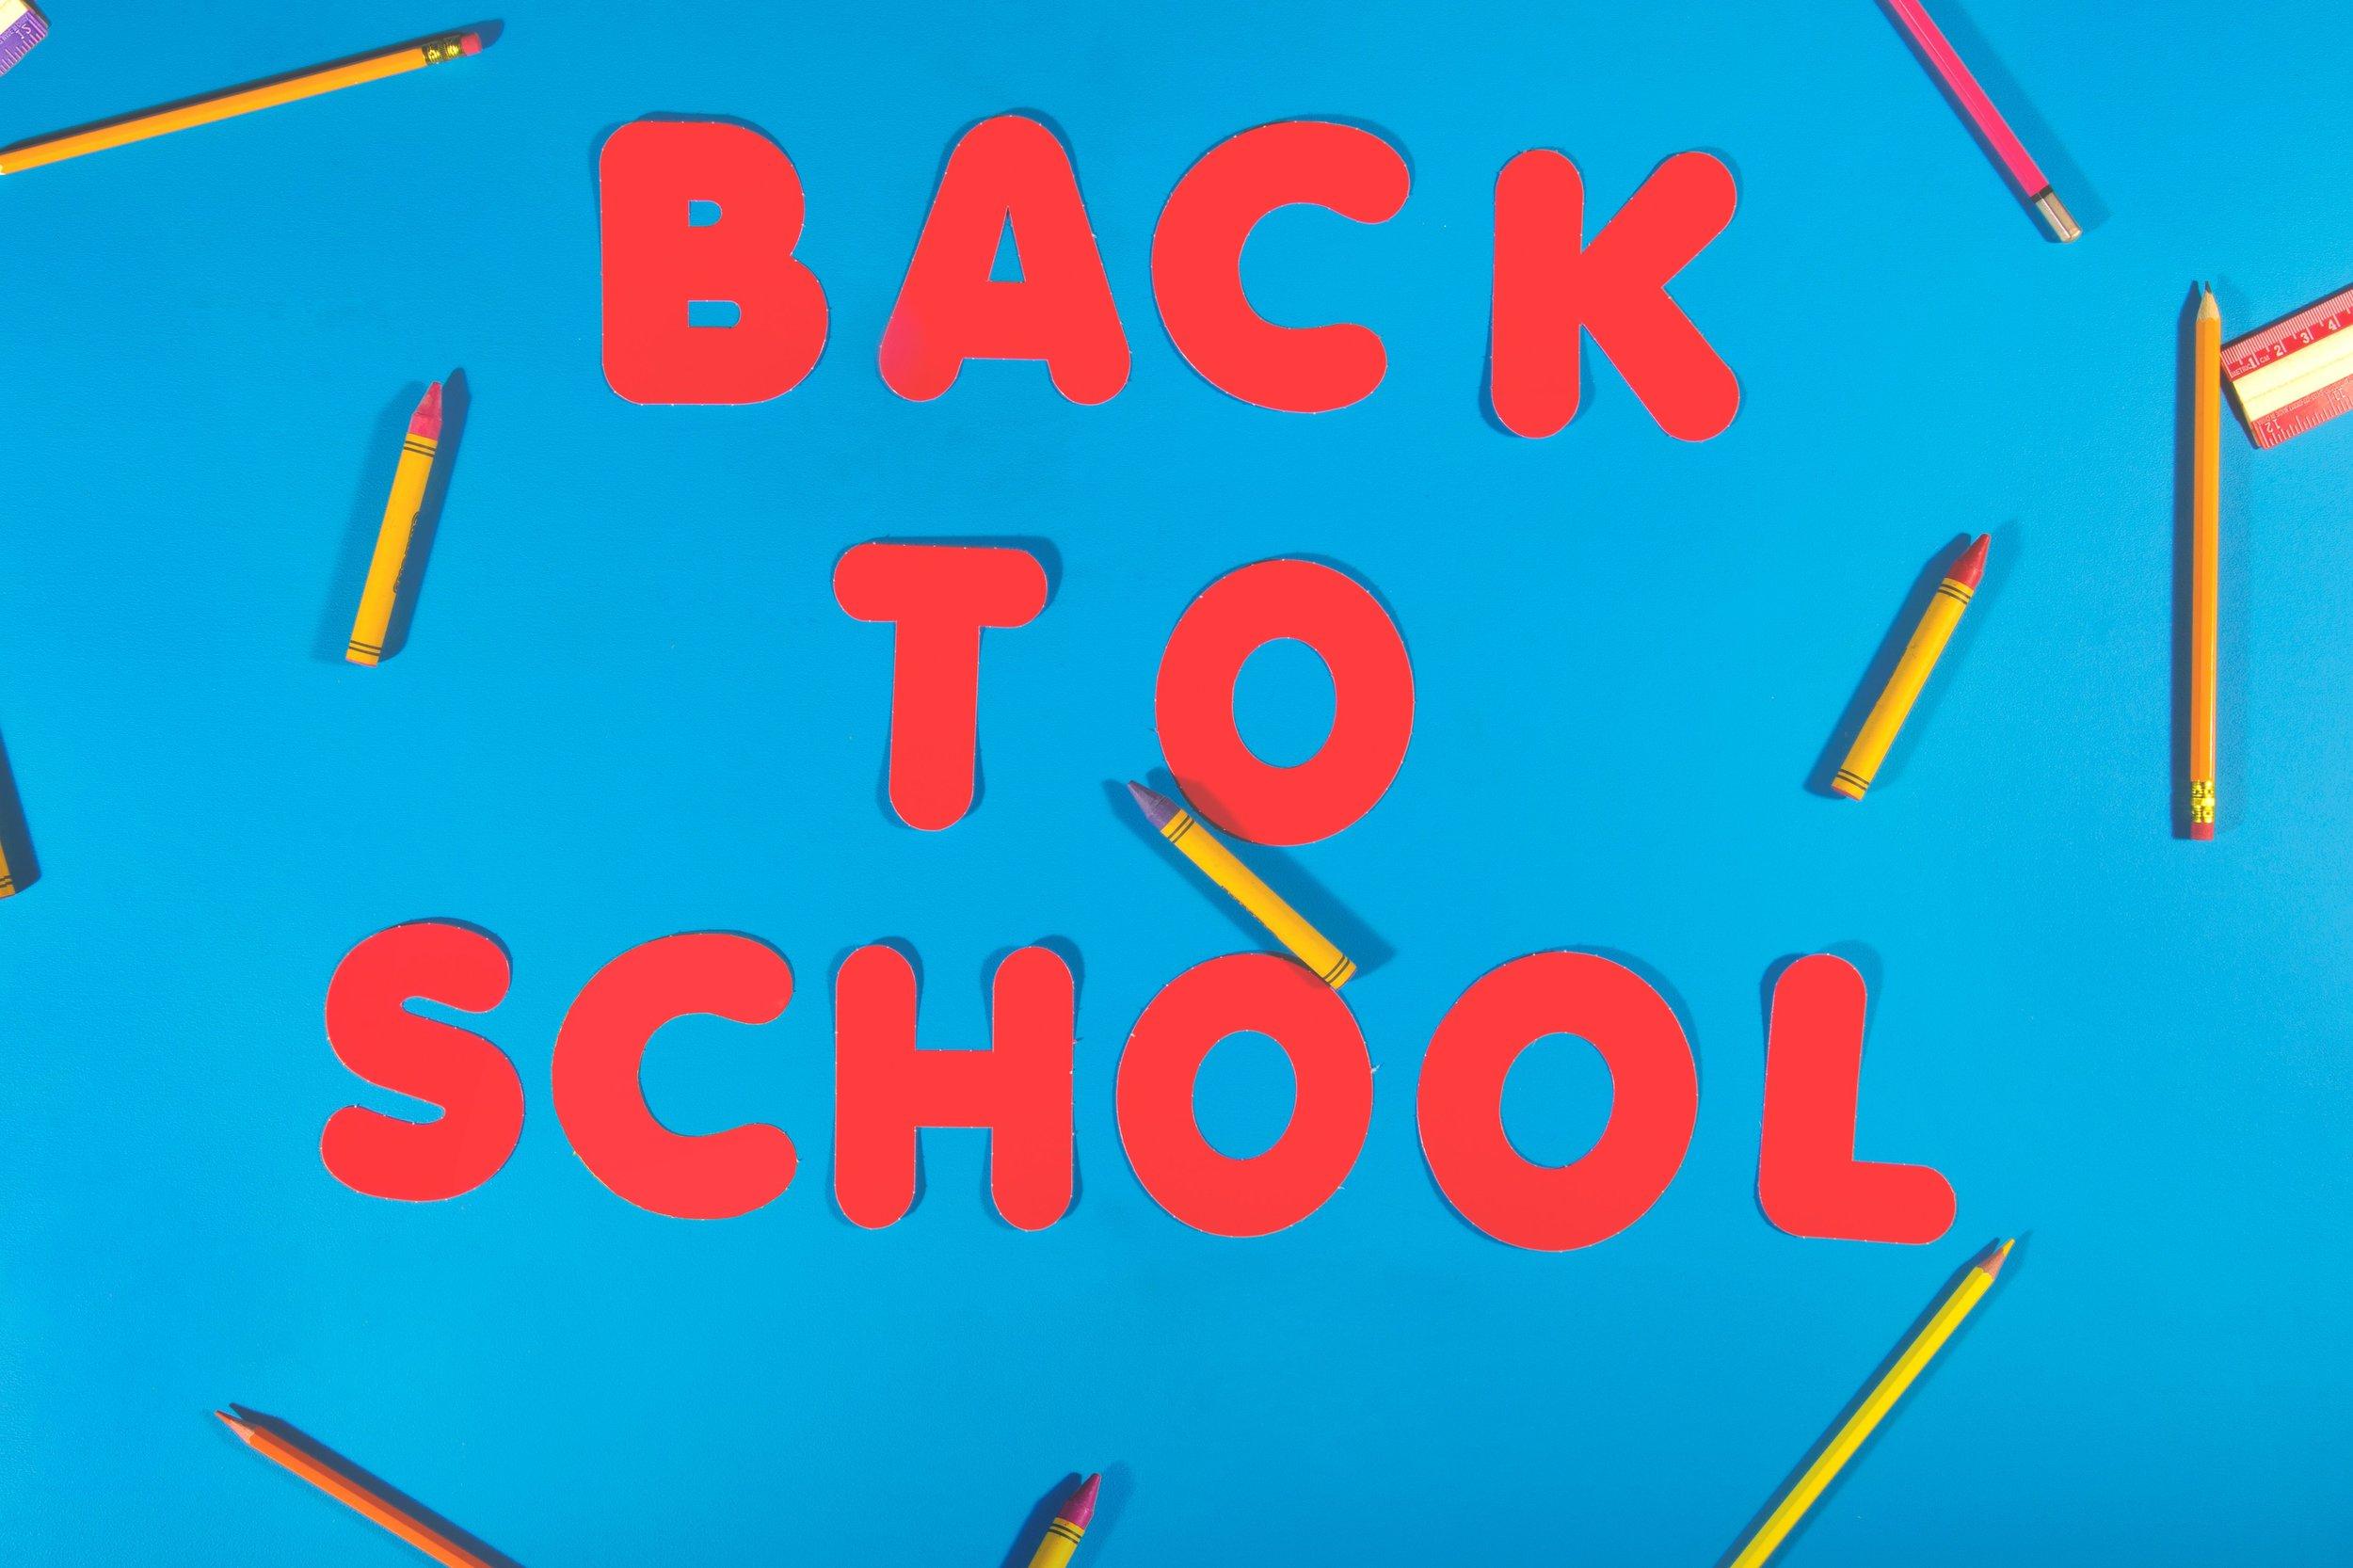 back-to-school_4460x4460.jpg